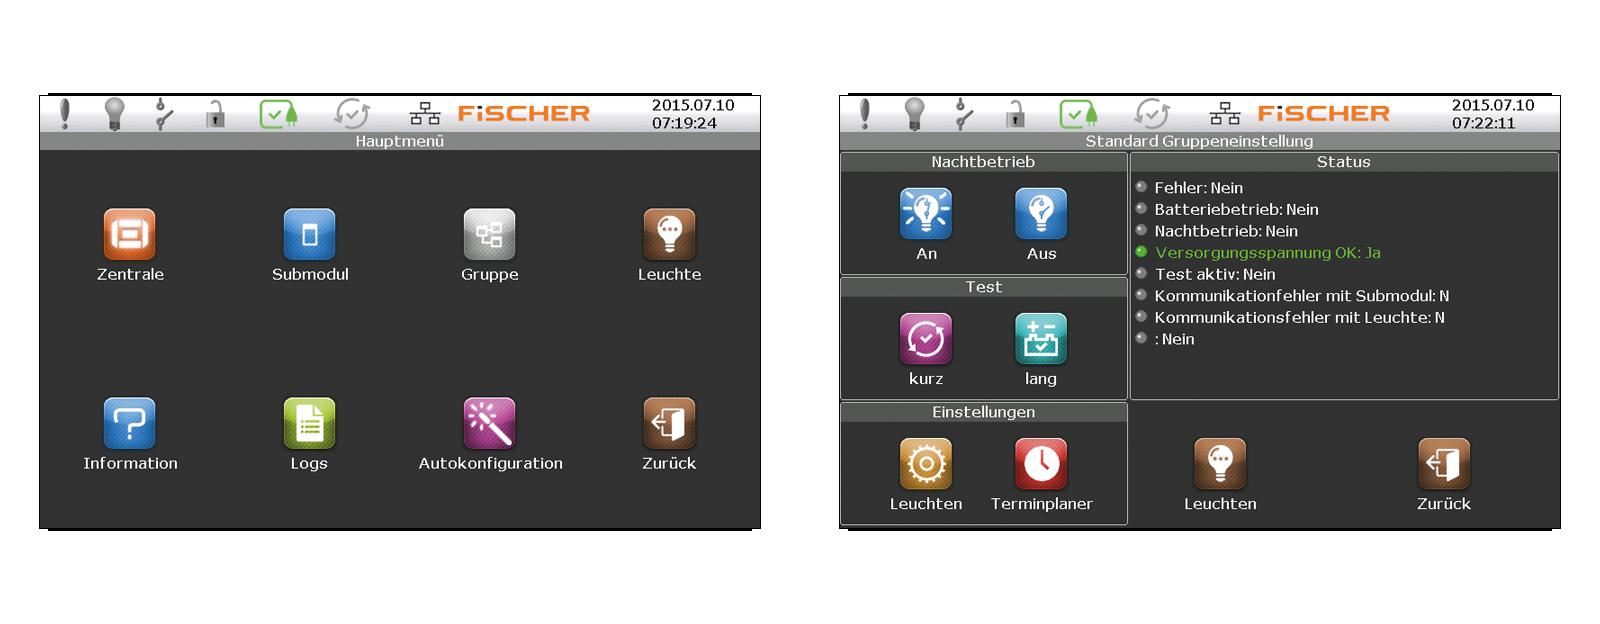 ECC2-Touch-2-Displays